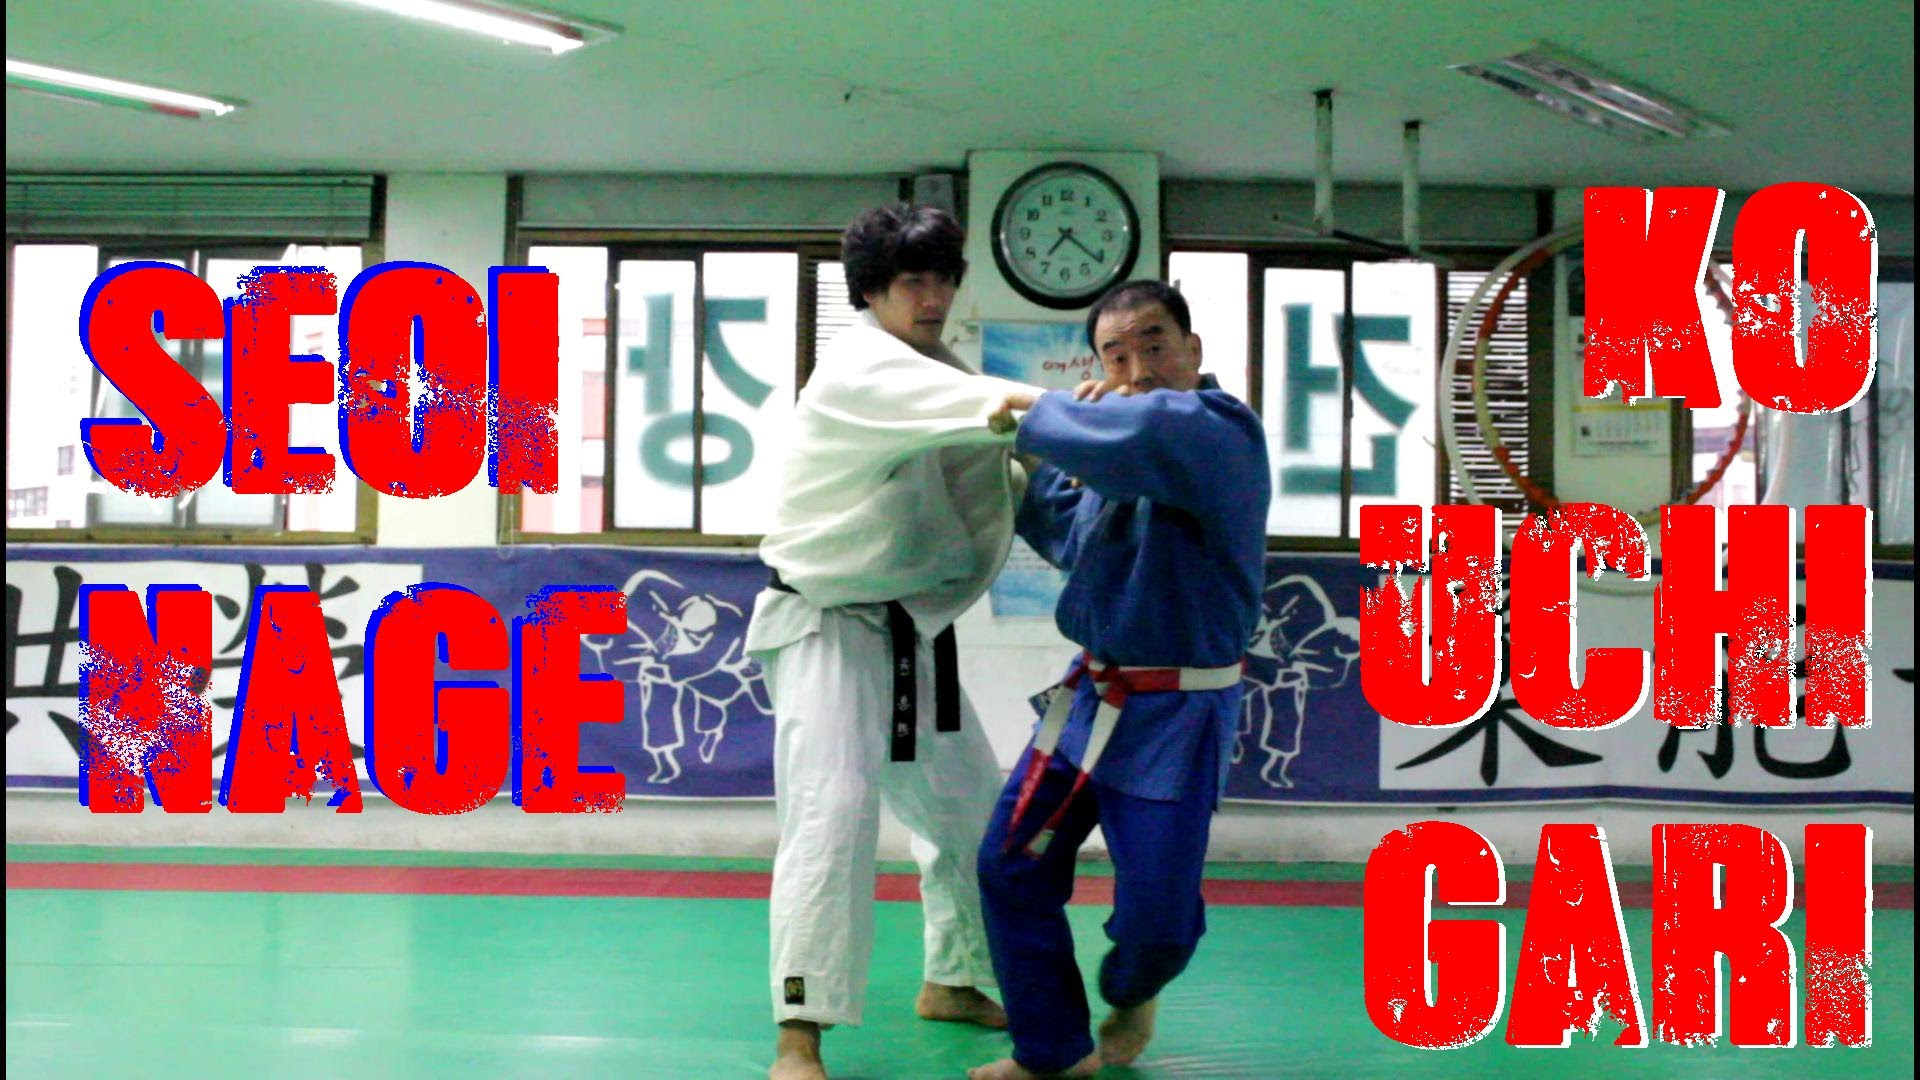 Seoi Nage and Ko Uchi Gari Combination by Korean 7th Dan